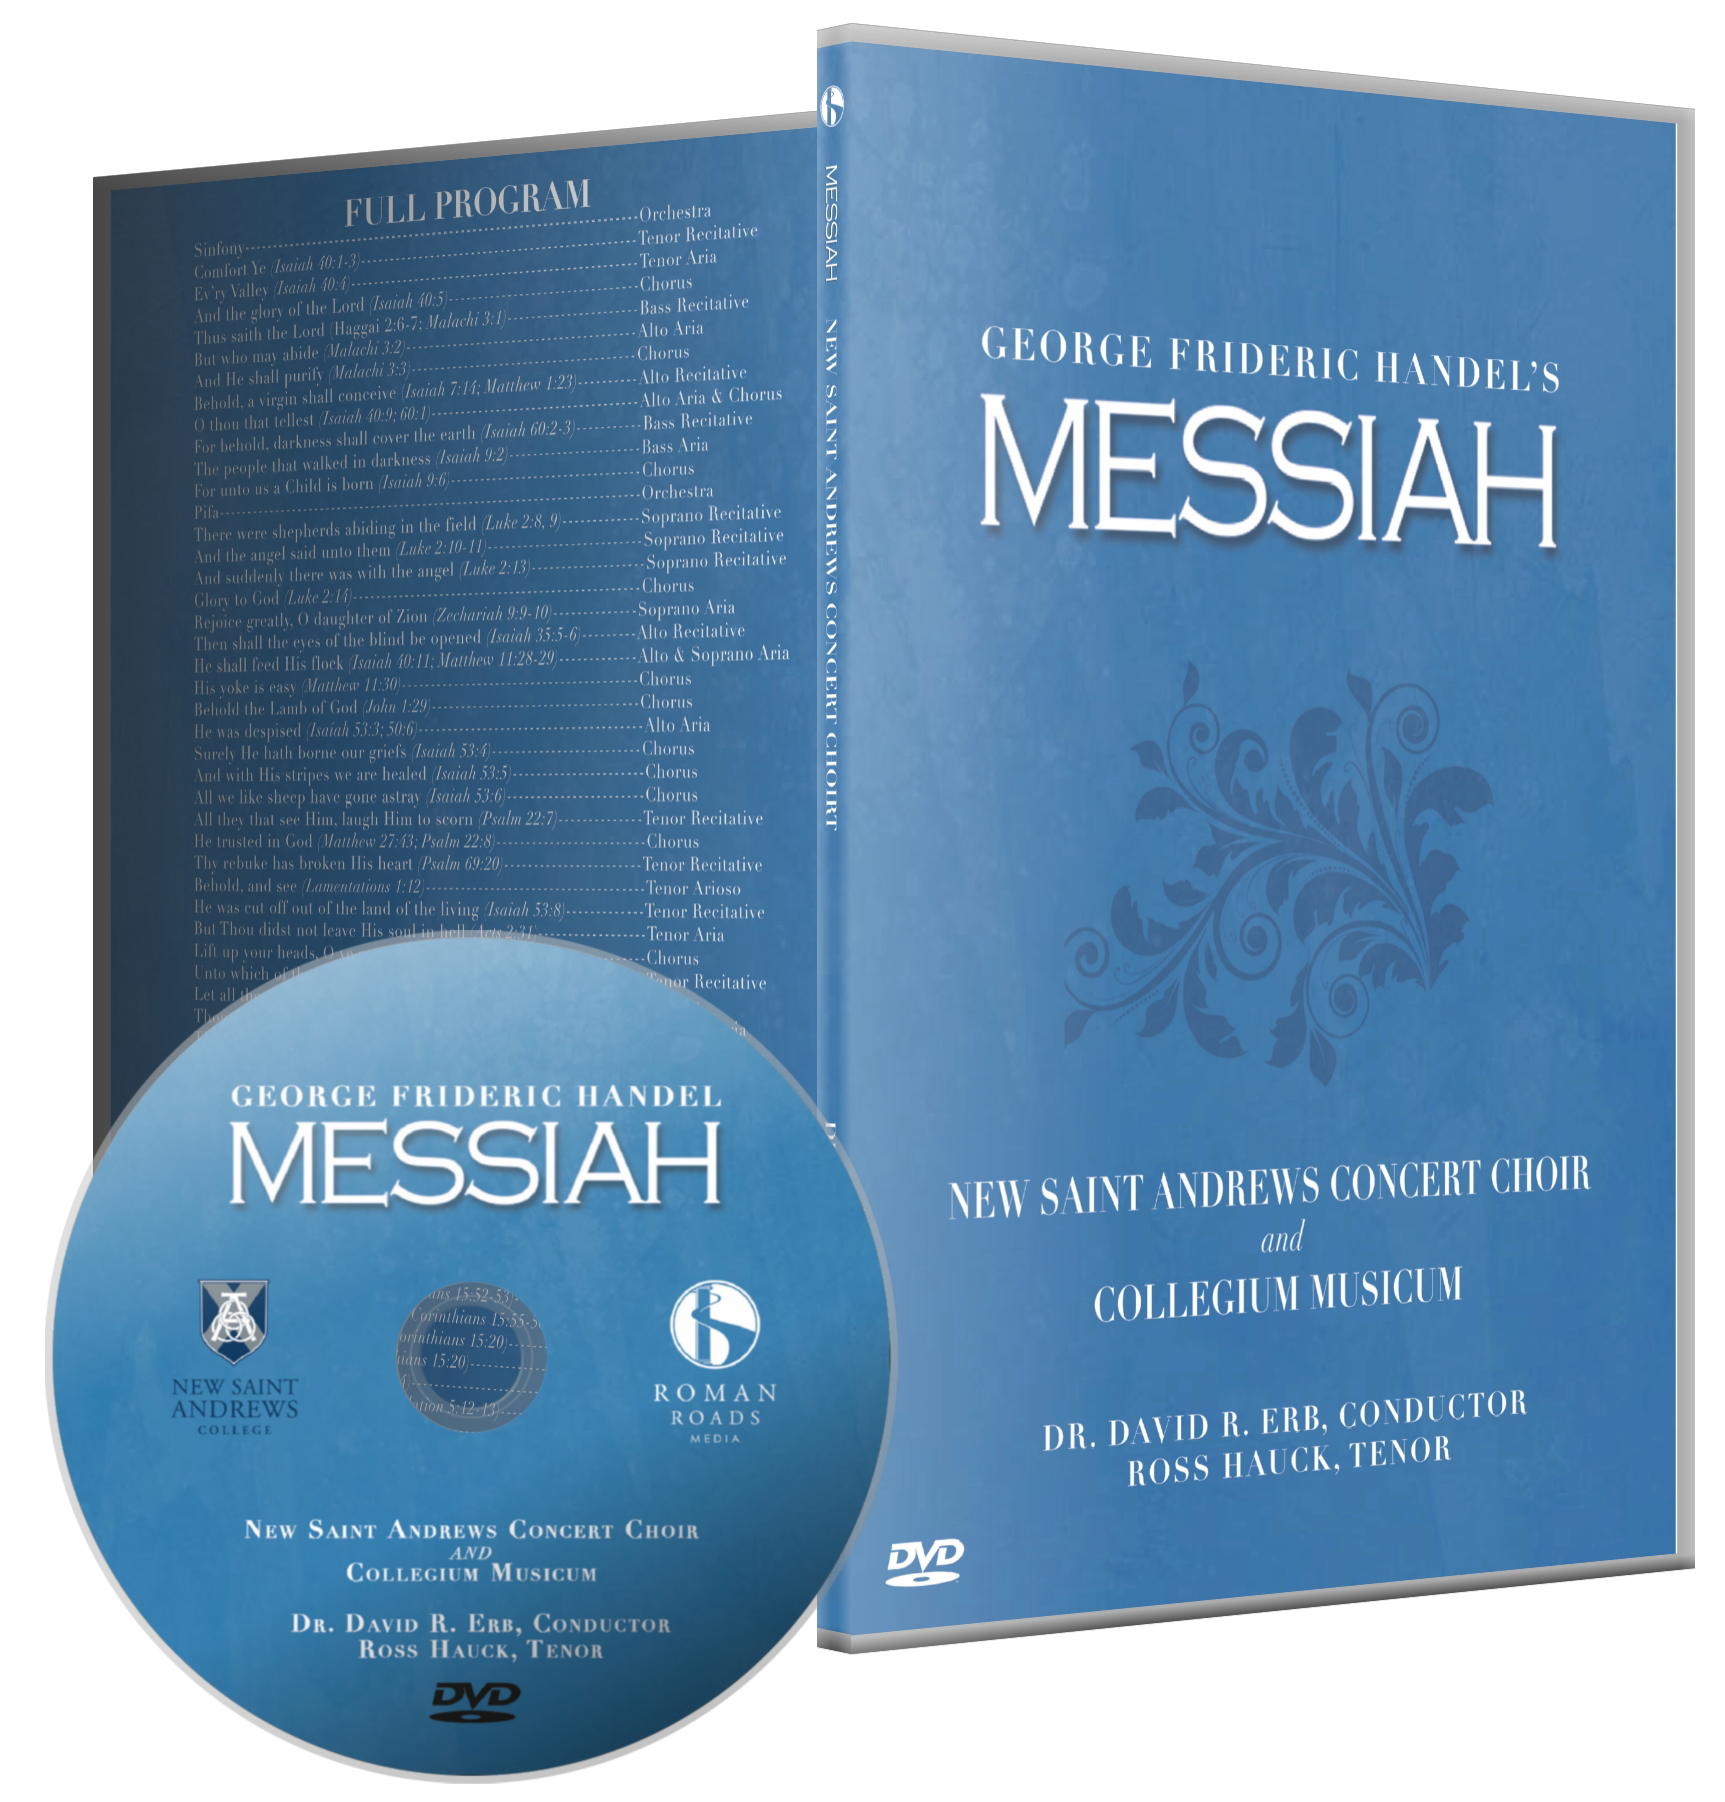 Handle's Messiah DVD case